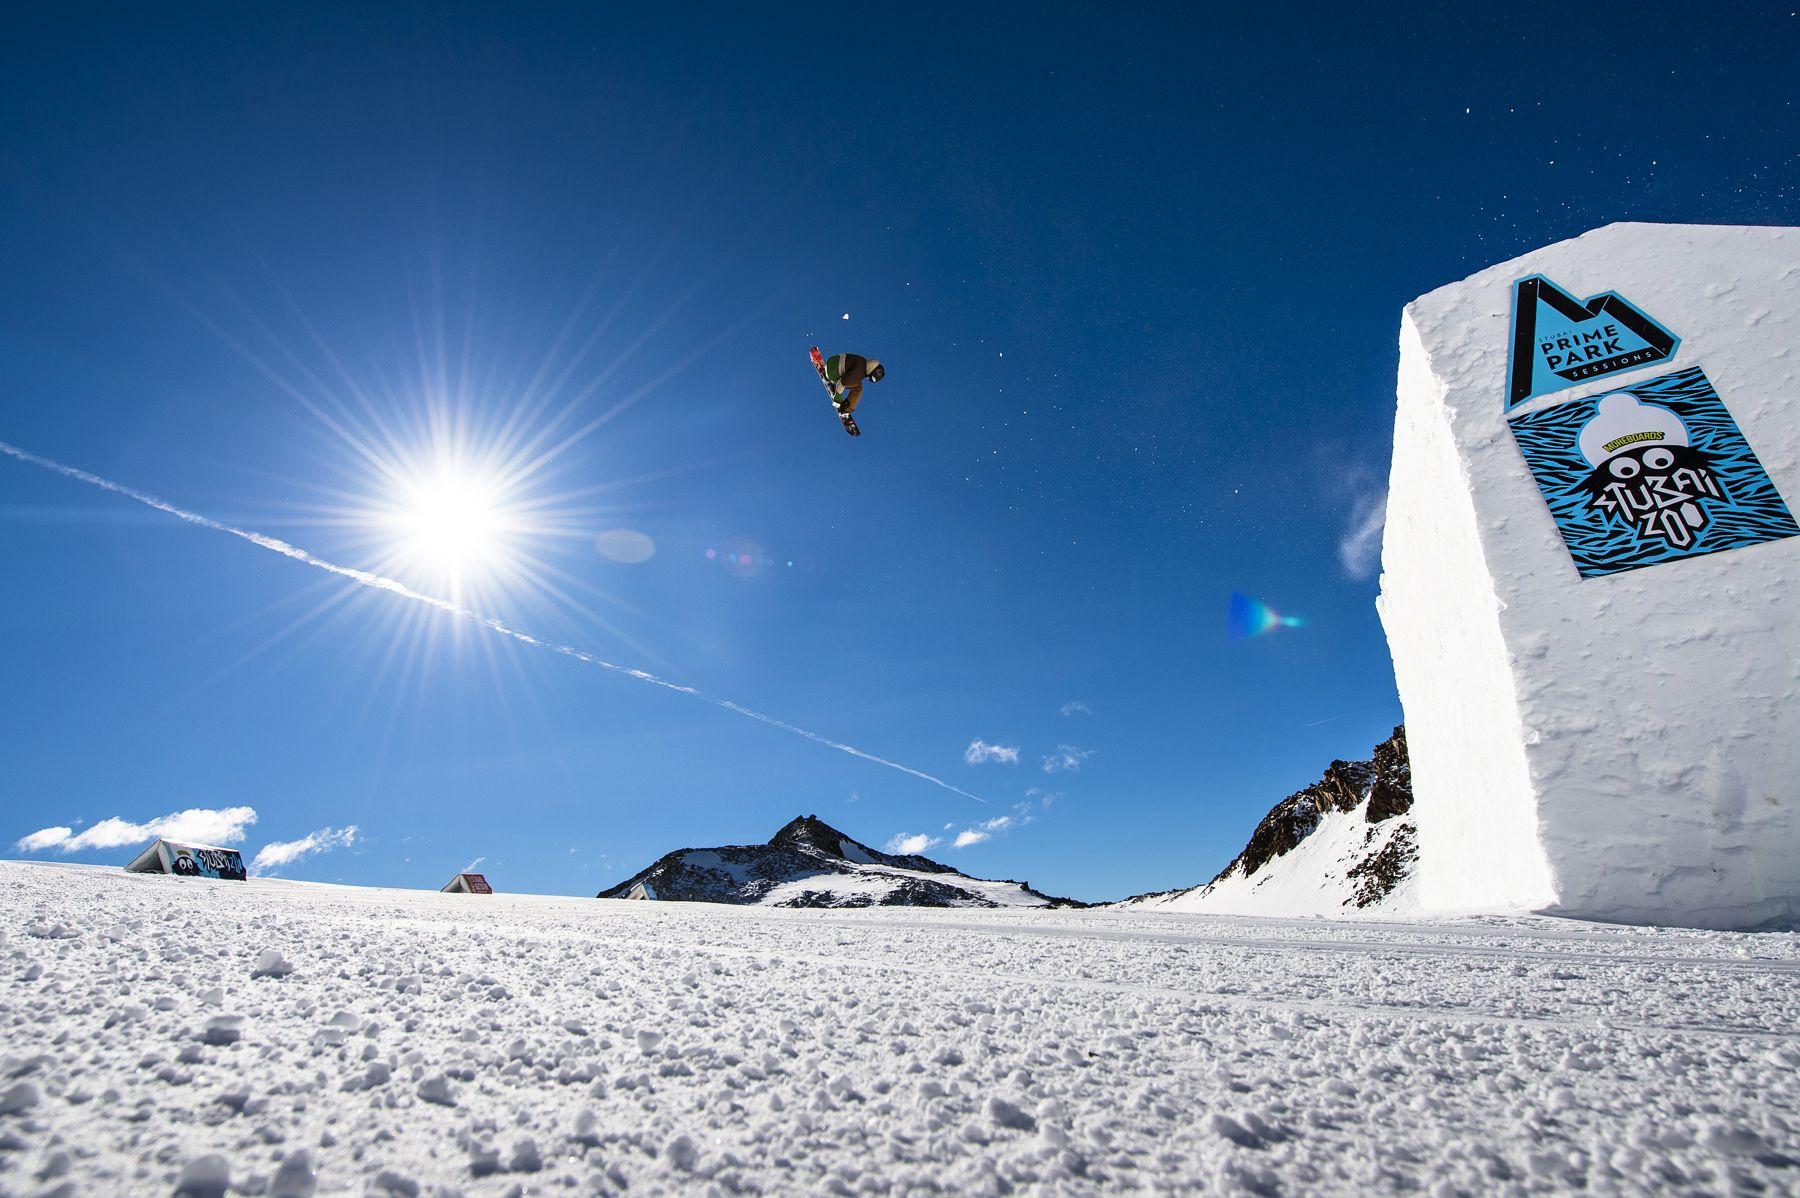 Erfolgreicher Start der Stubai Prime Park Sessions 2014 >> http://www.snowlab.de/news.php?news_id=1465 #stubaiergletscher #PrimeParkSession2014 #snowboardevent